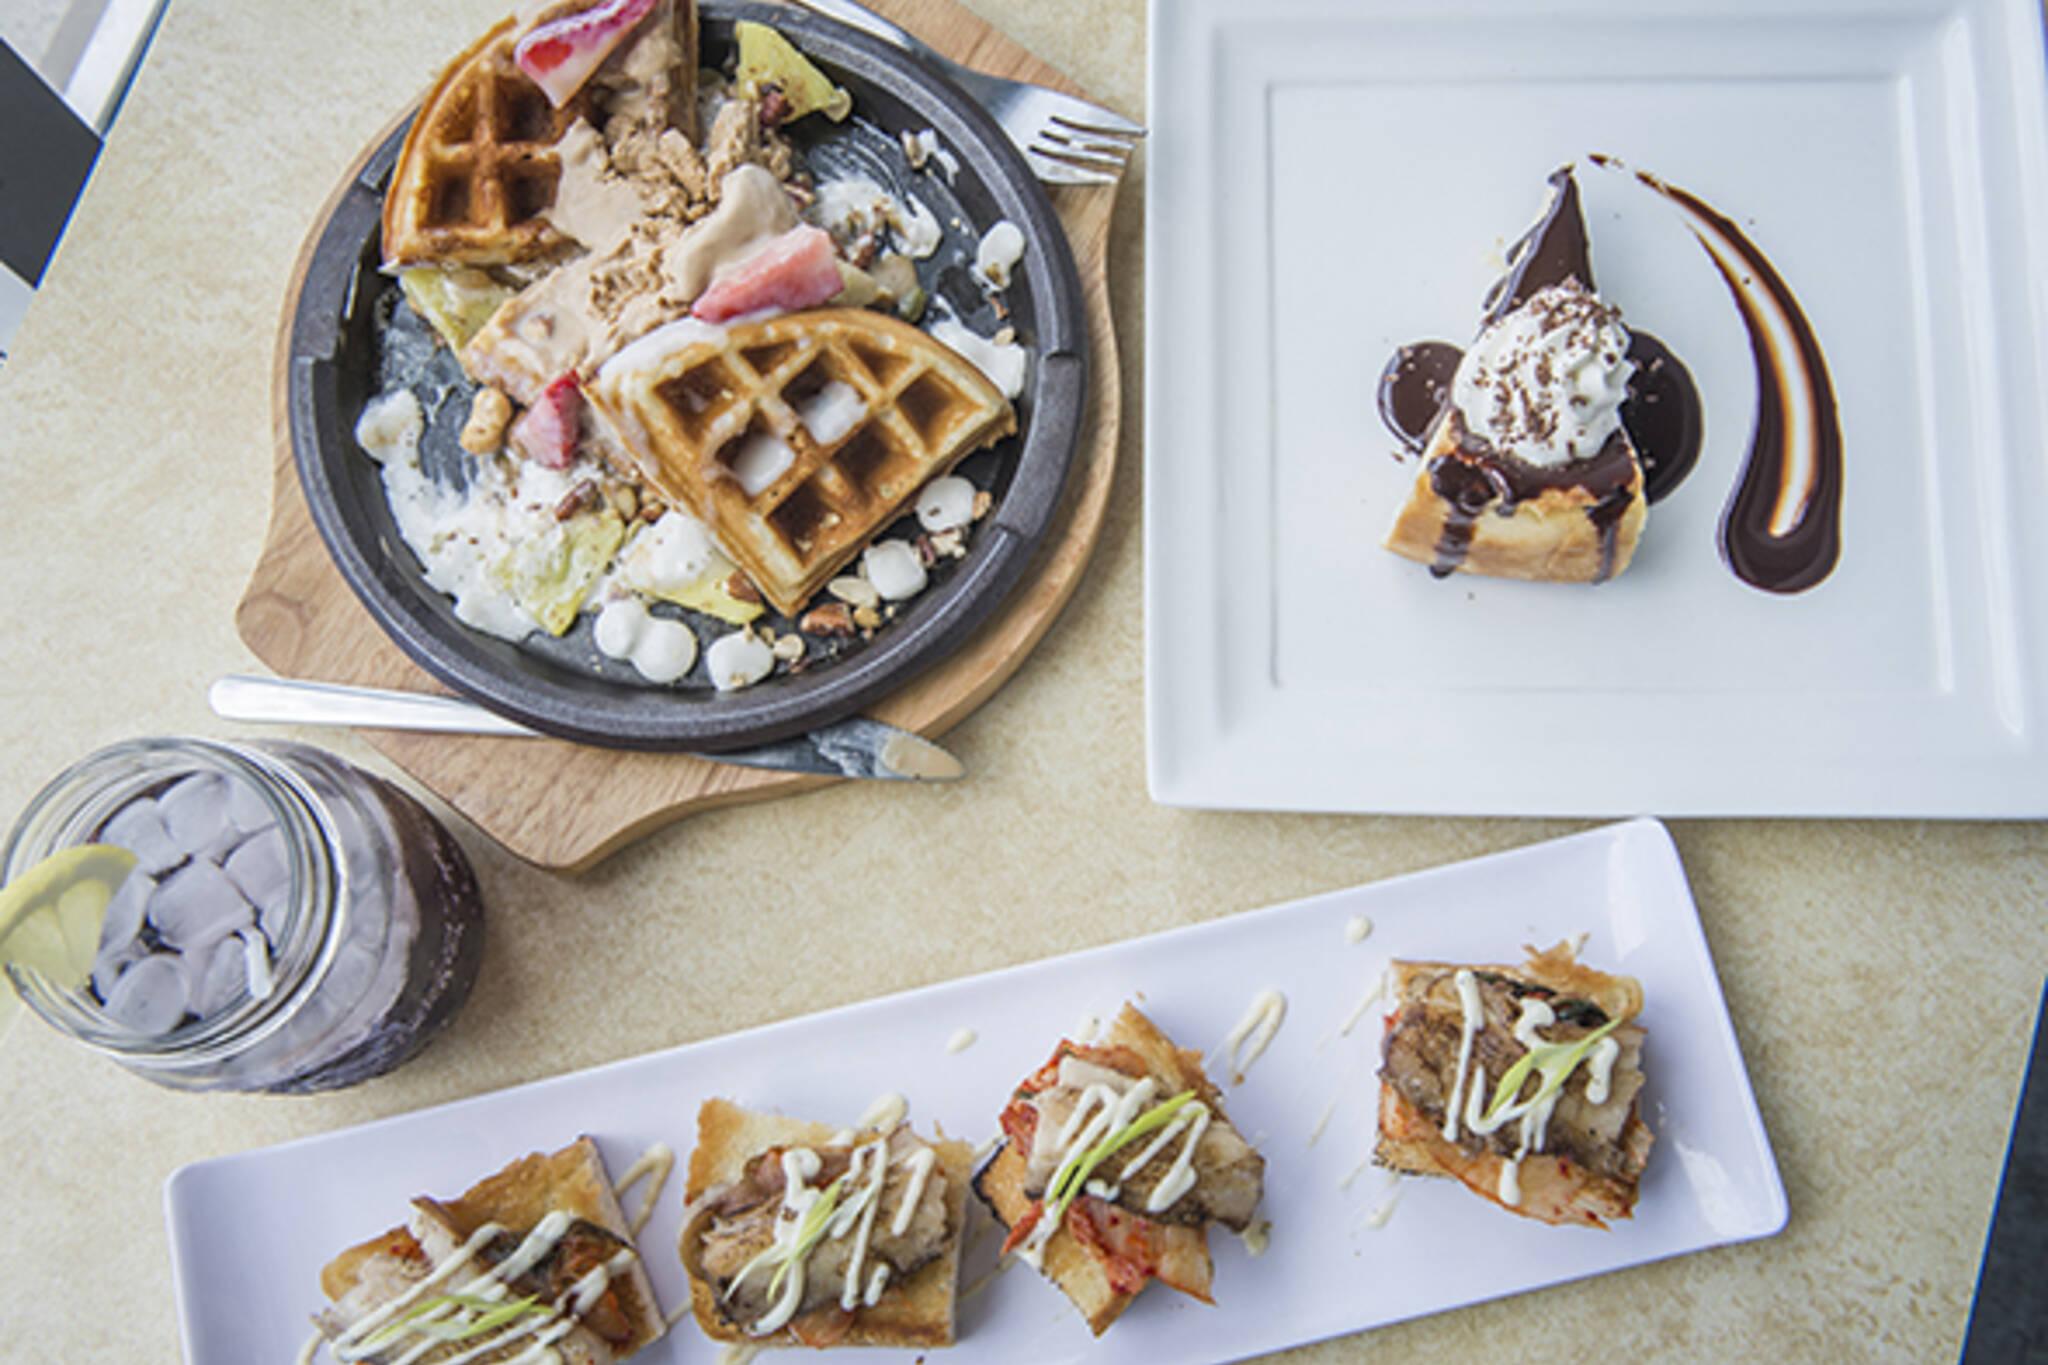 Sweet Esc Dessert Cafe Toronto